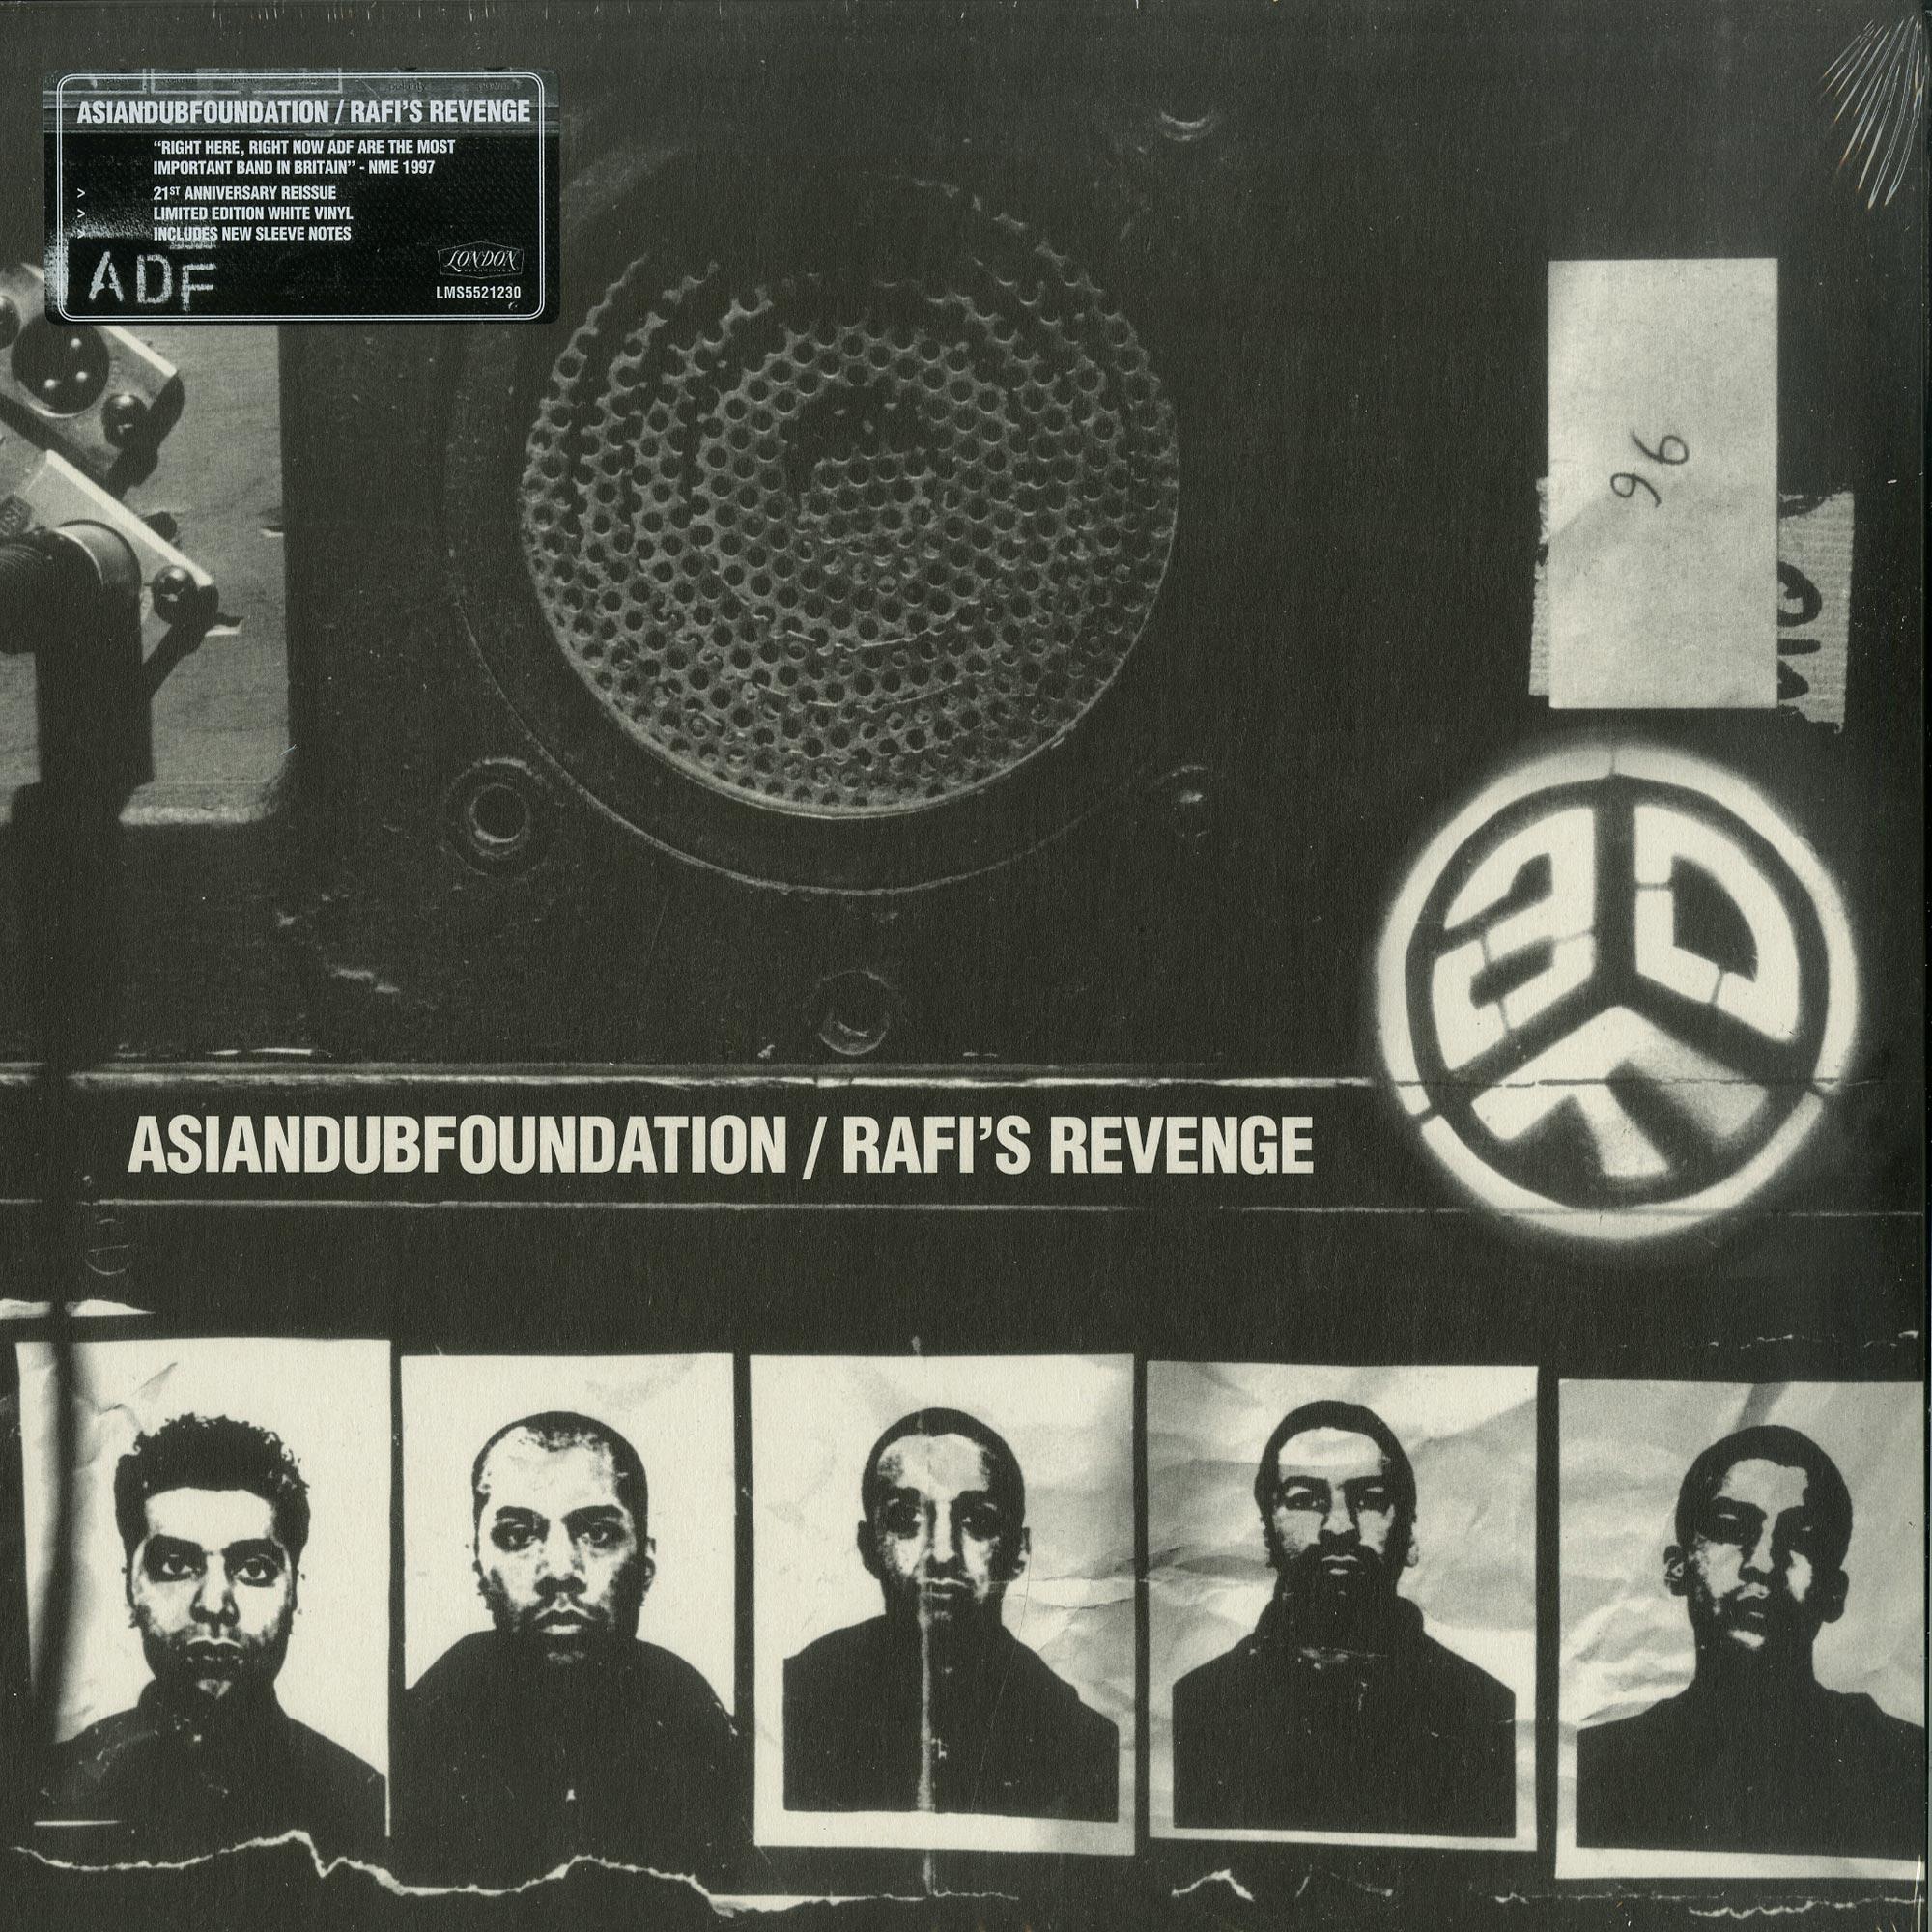 Asian Dub Foundation - RAFIS REVENGE